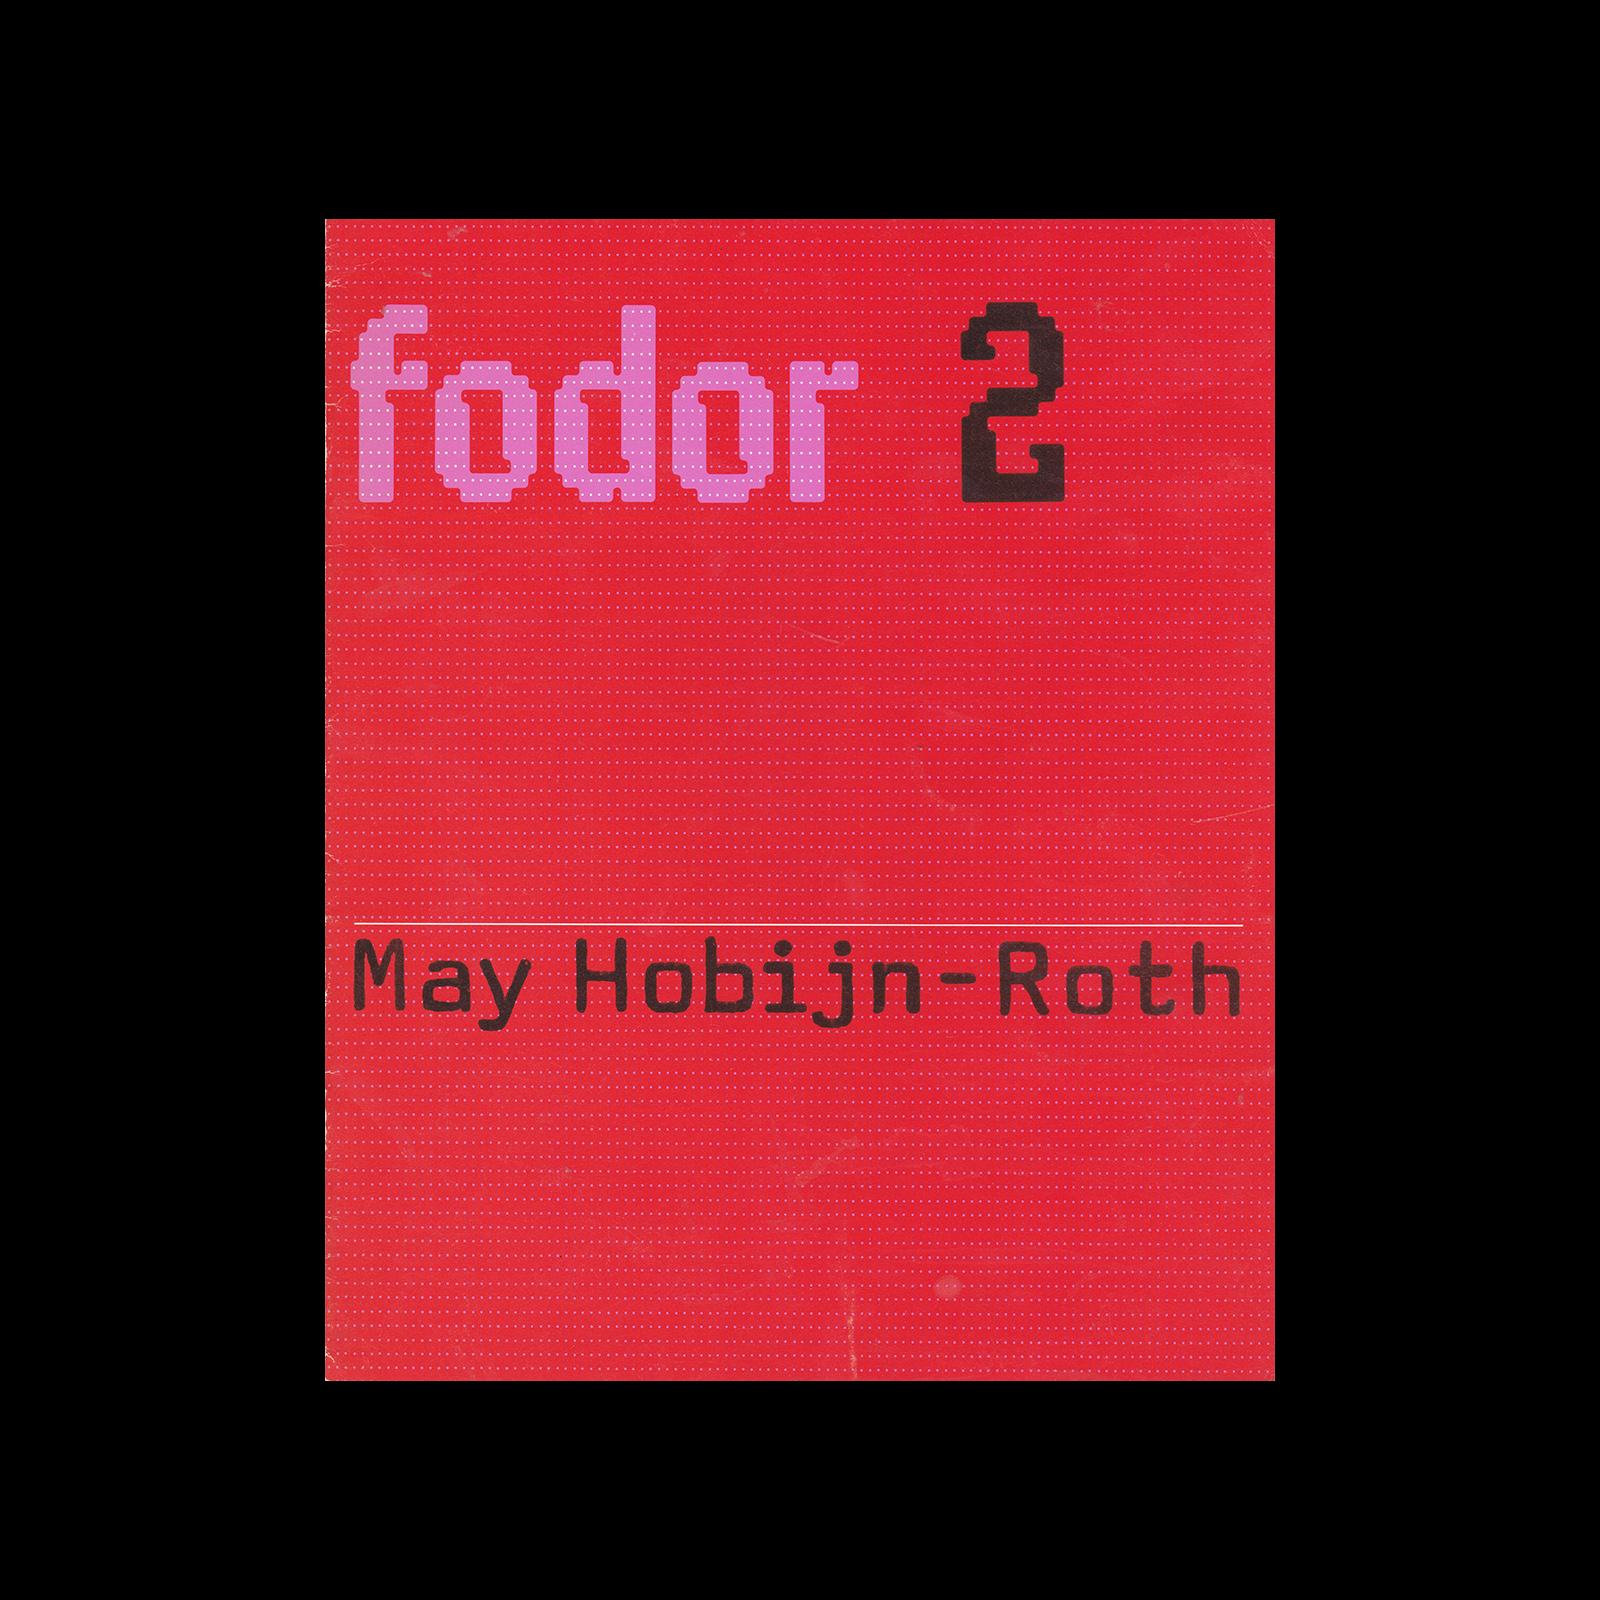 Fodor 2, 1972 - May Hobijn-Roth. Designed by Wim Crouwel